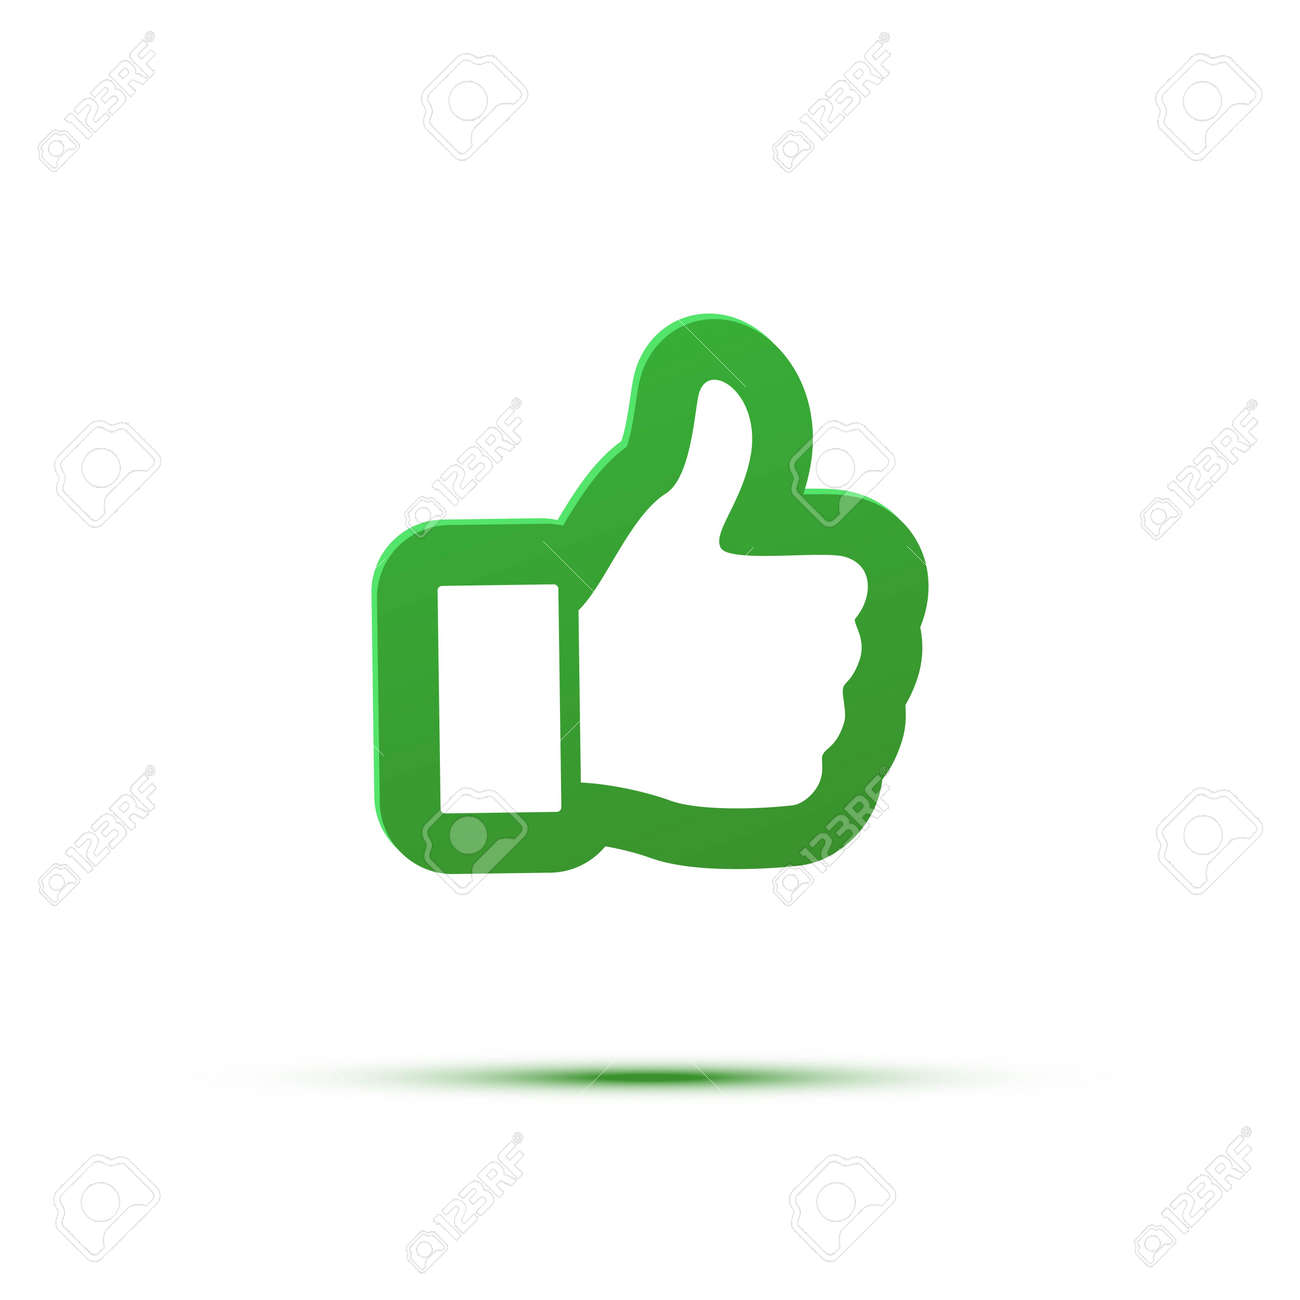 Thumb up like an icon. Good, ok, or follow symbol illustration. - 164030356